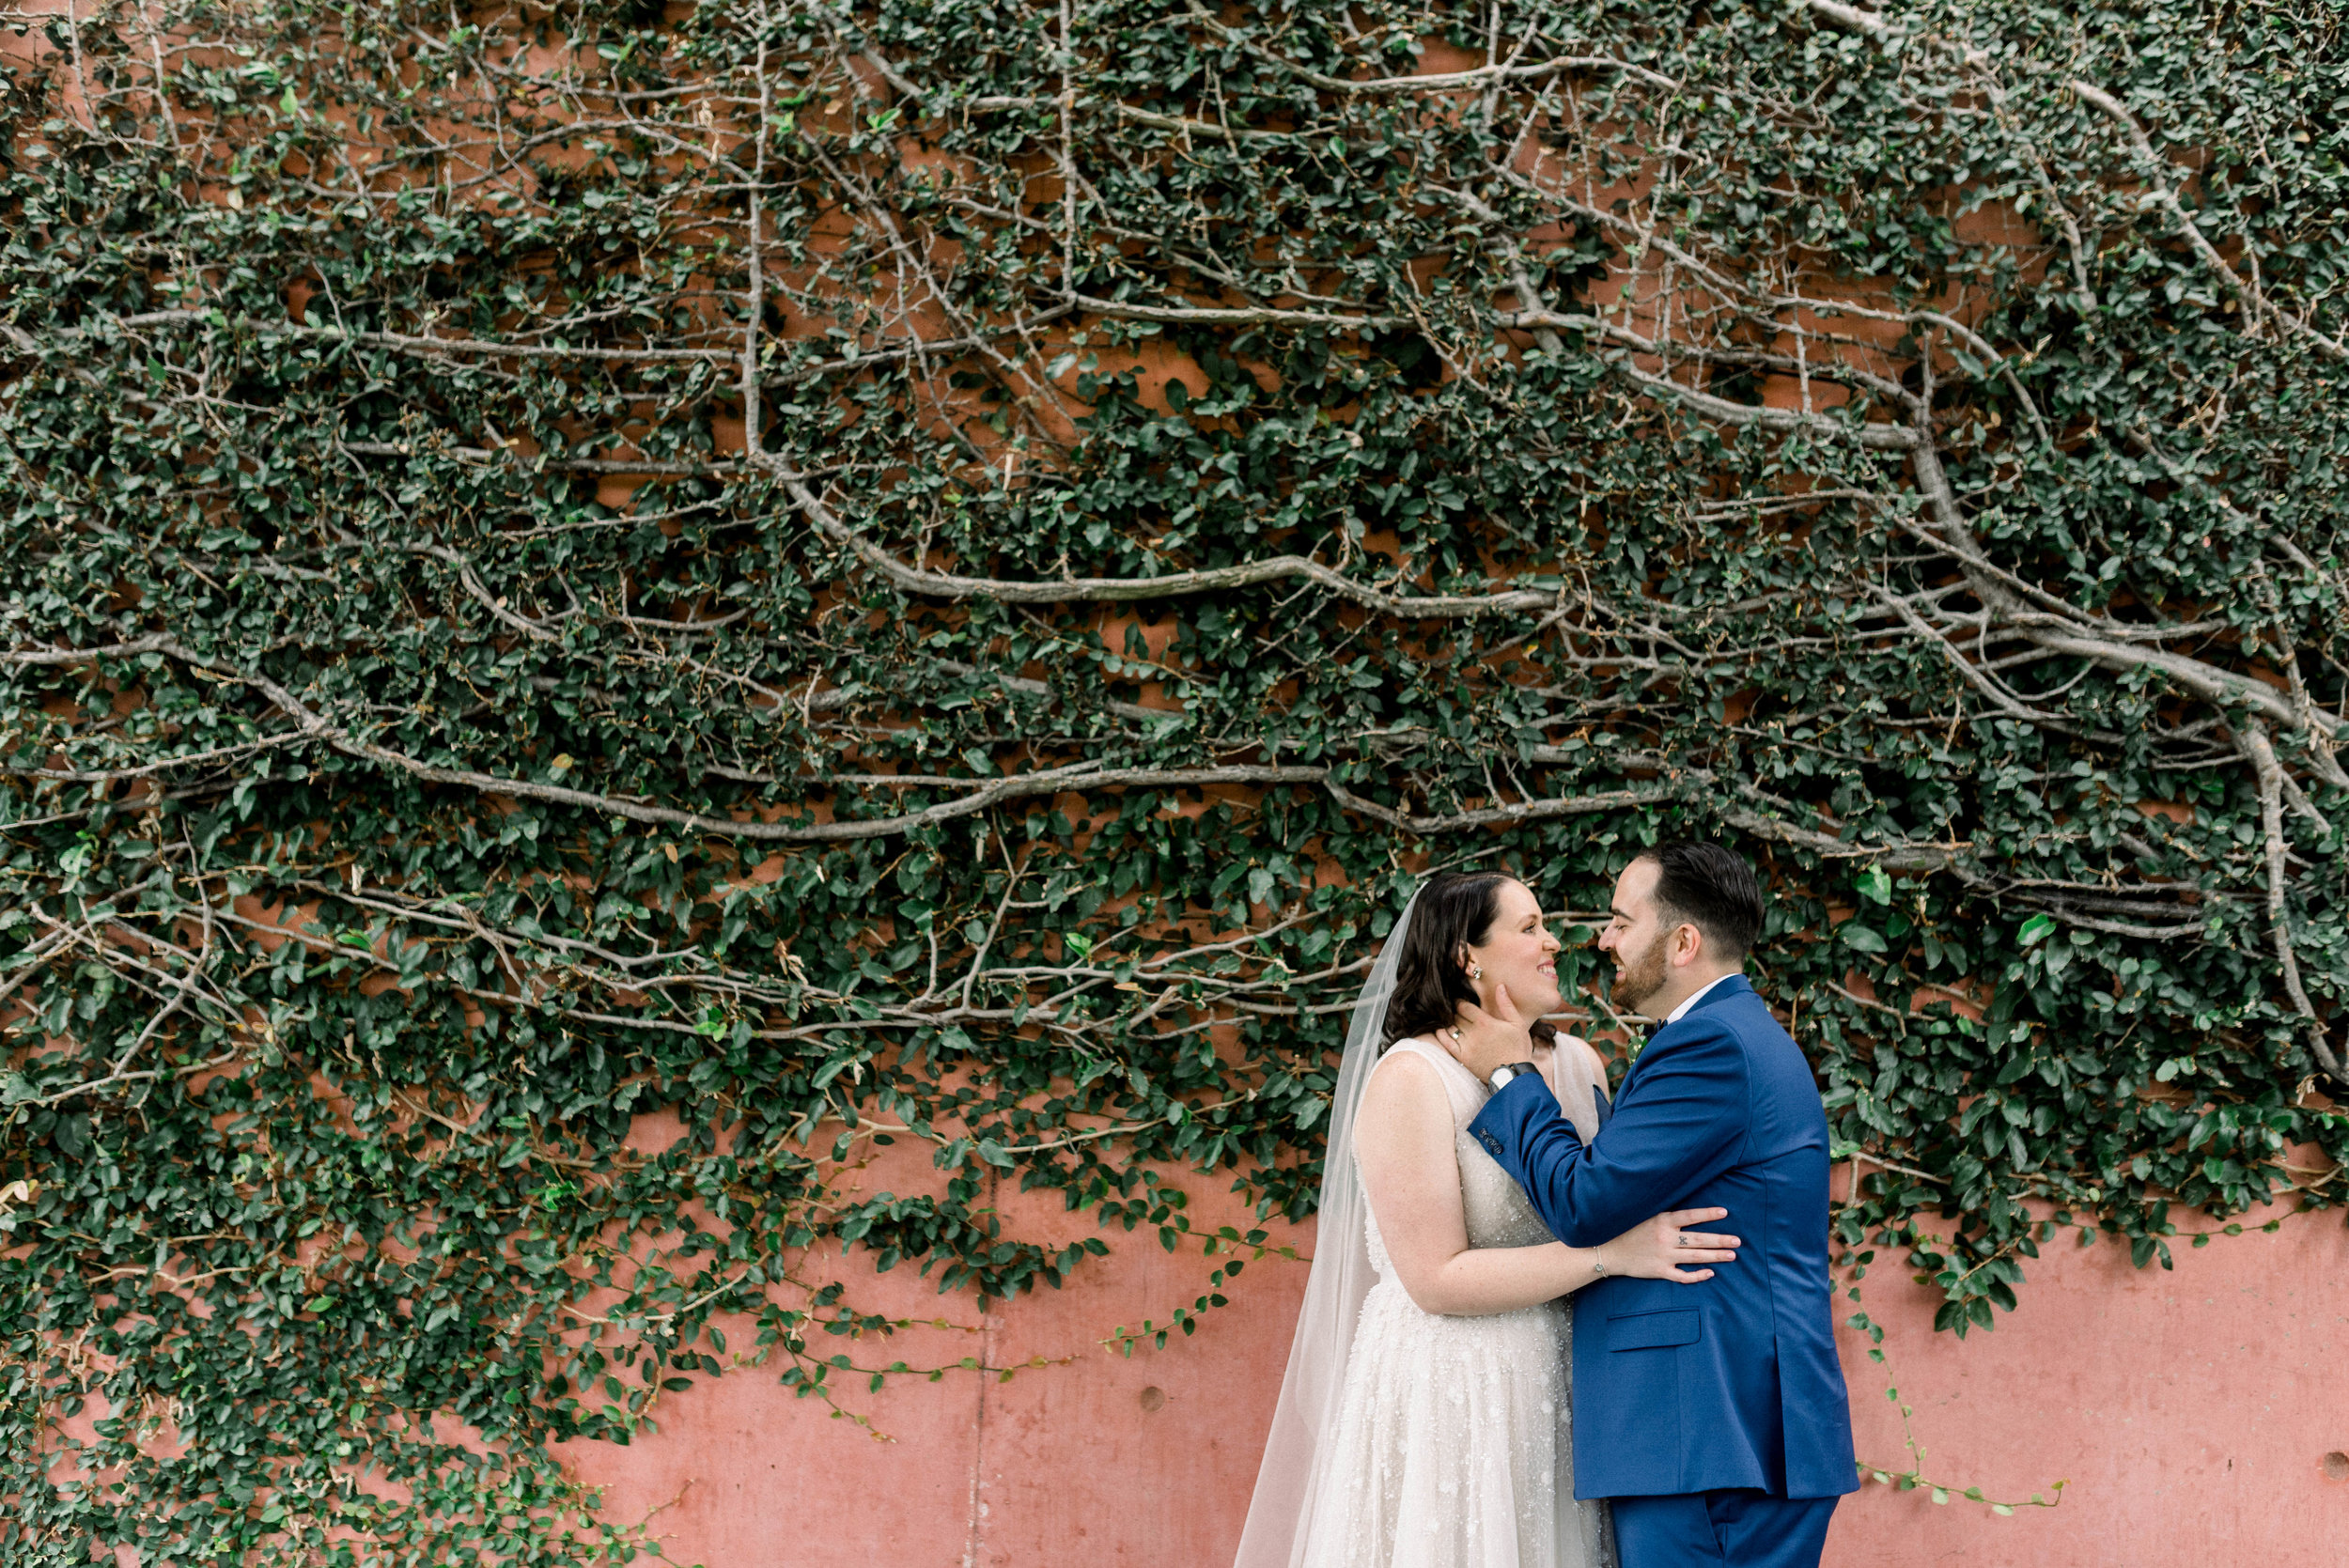 brisbane-city-wedding-photographer-romantic-wedding-65.jpg